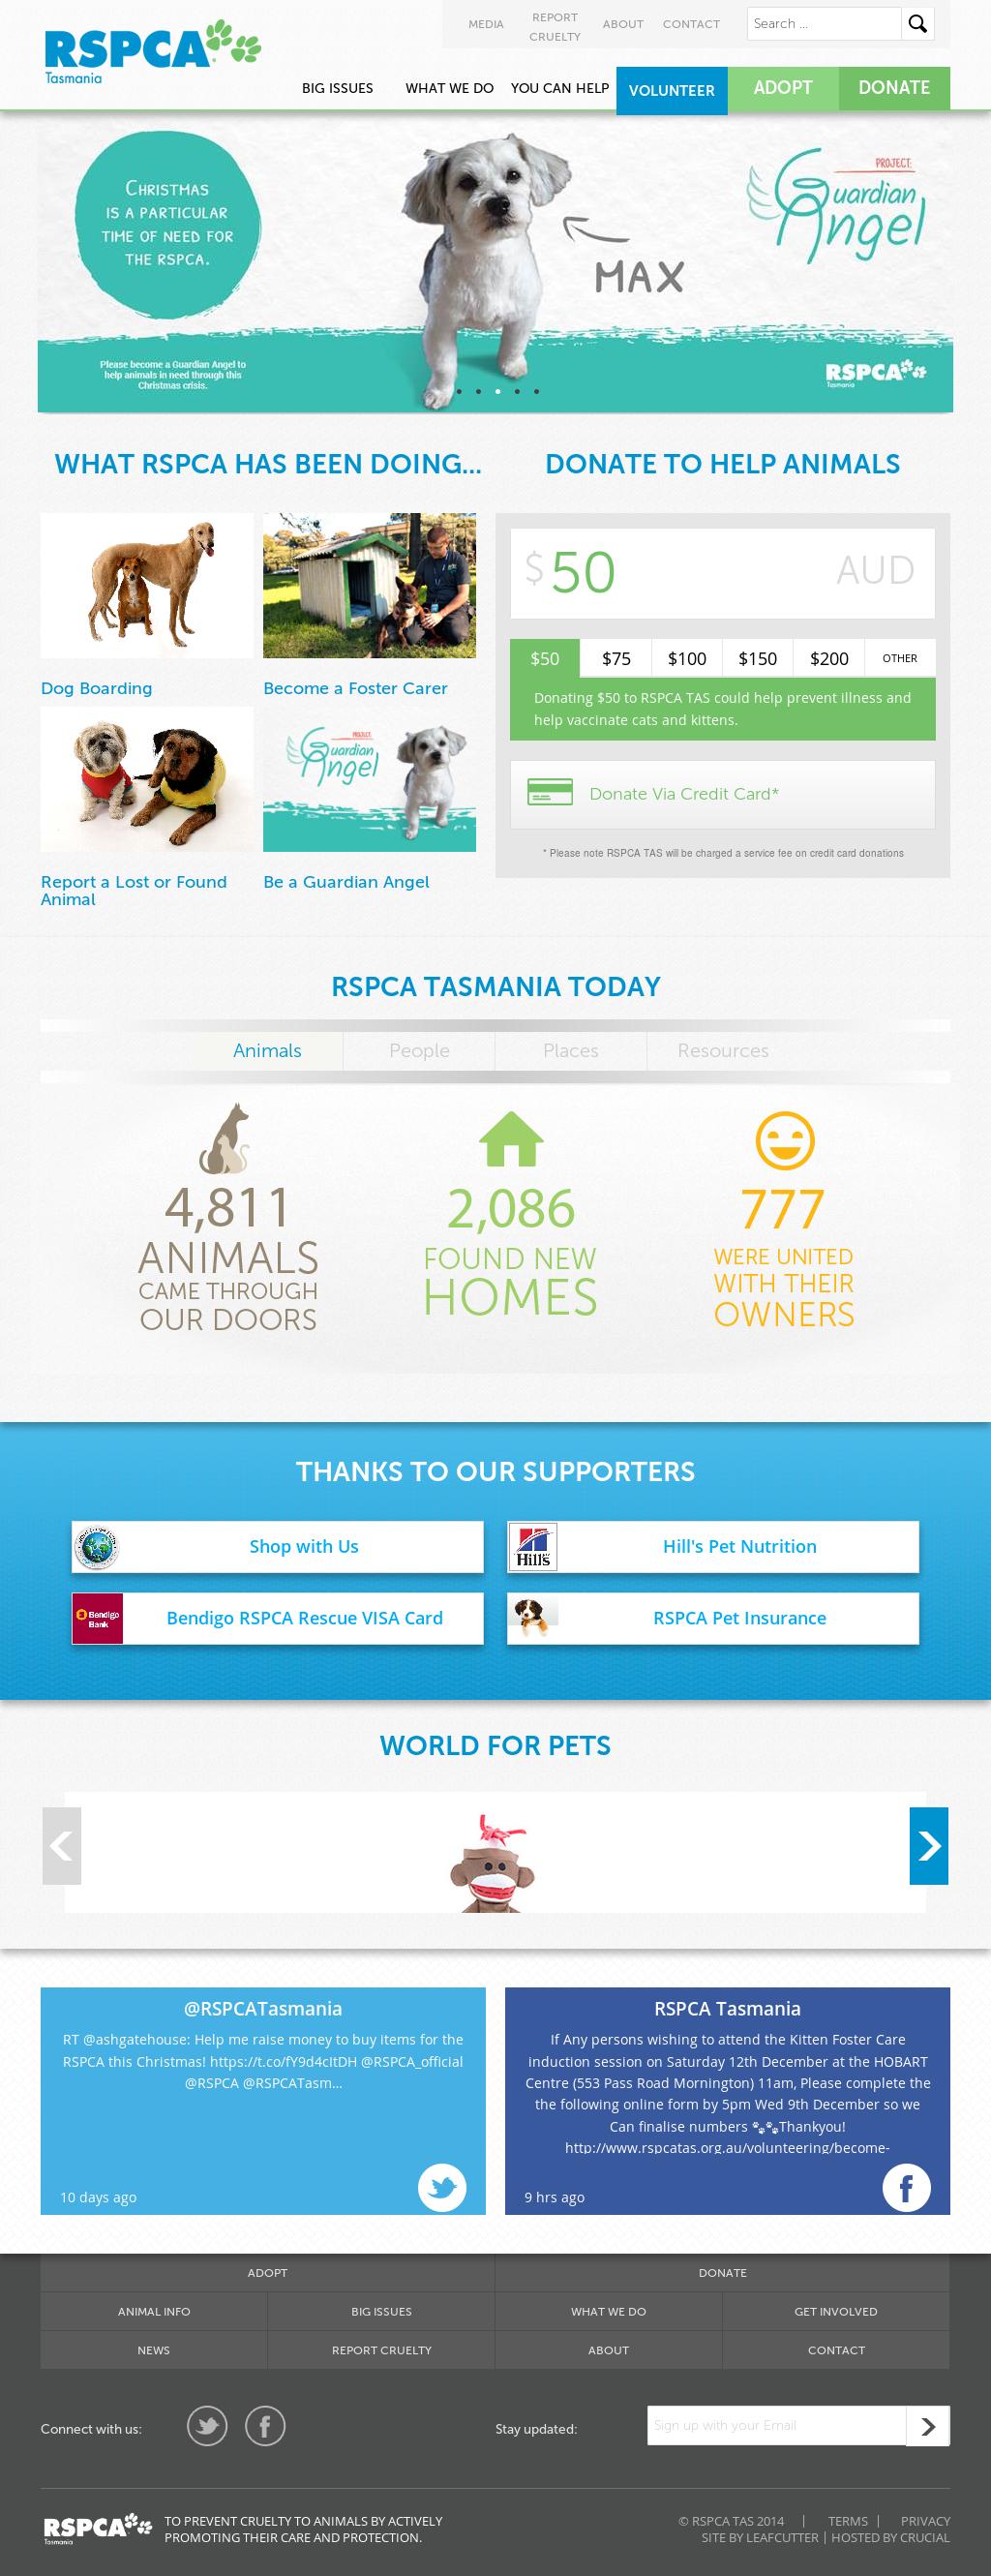 Rspca Tasmania Competitors, Revenue and Employees - Owler Company